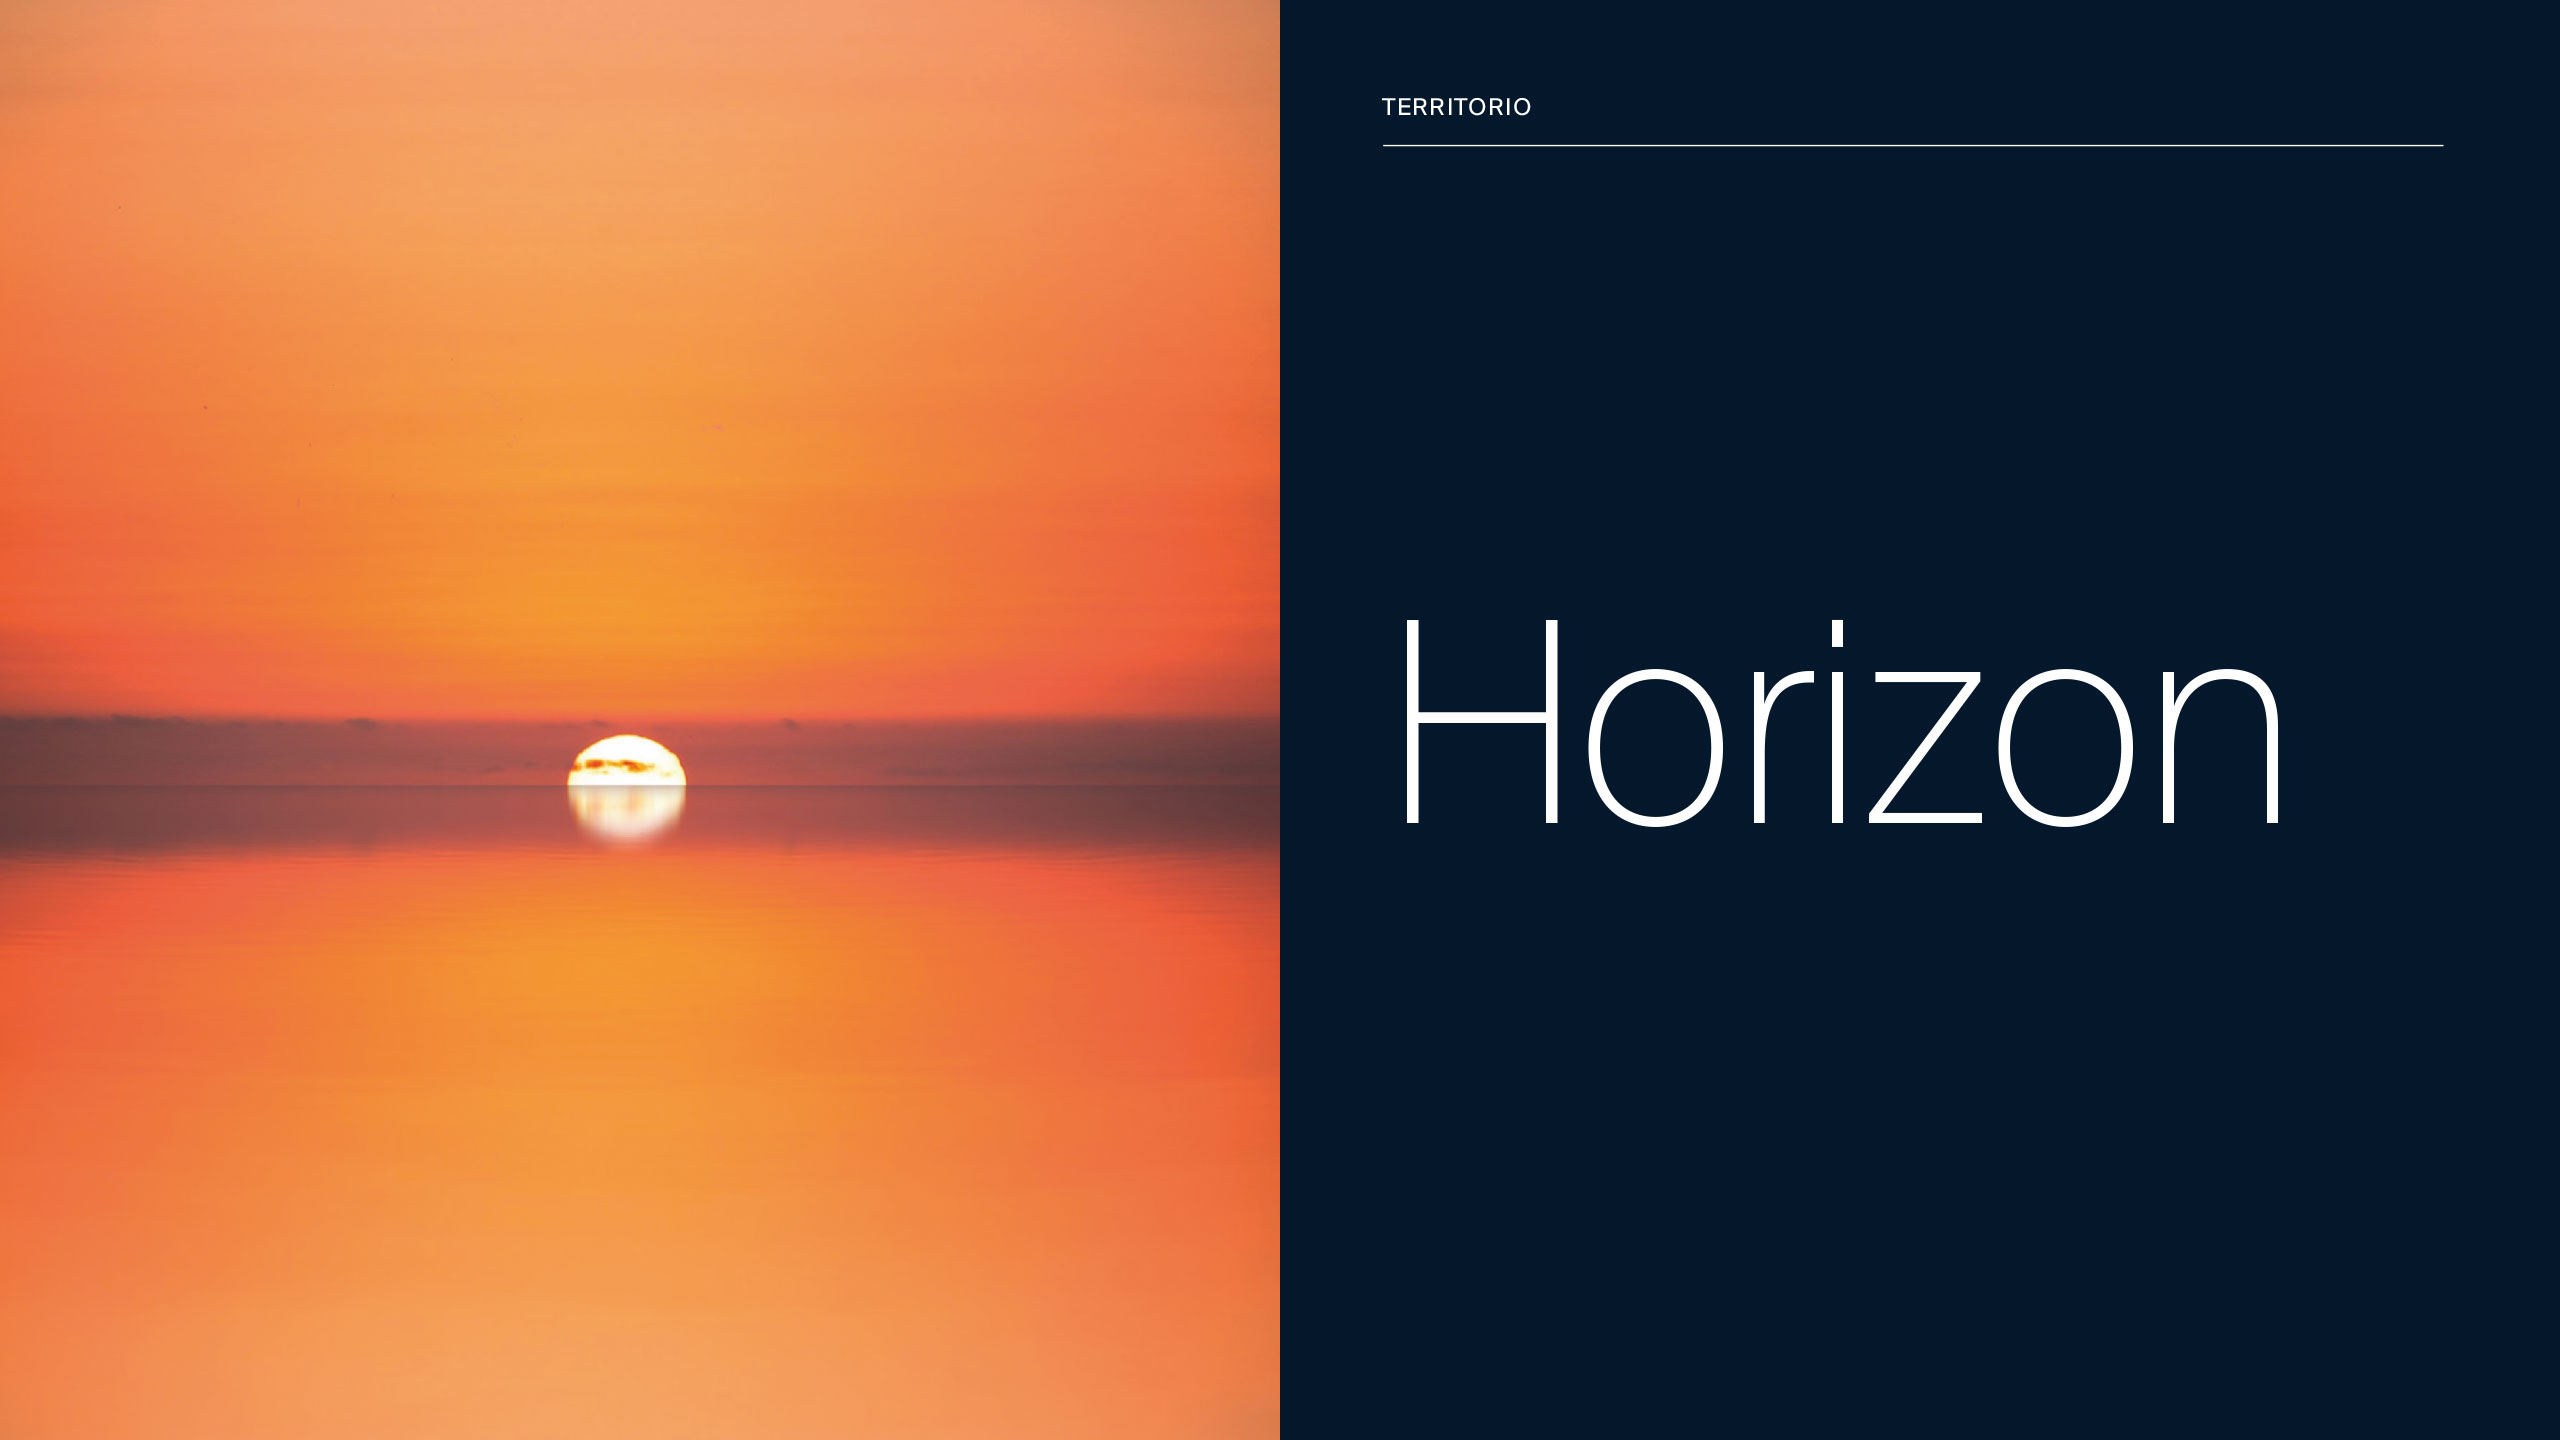 Horizon - Territorio Miranza